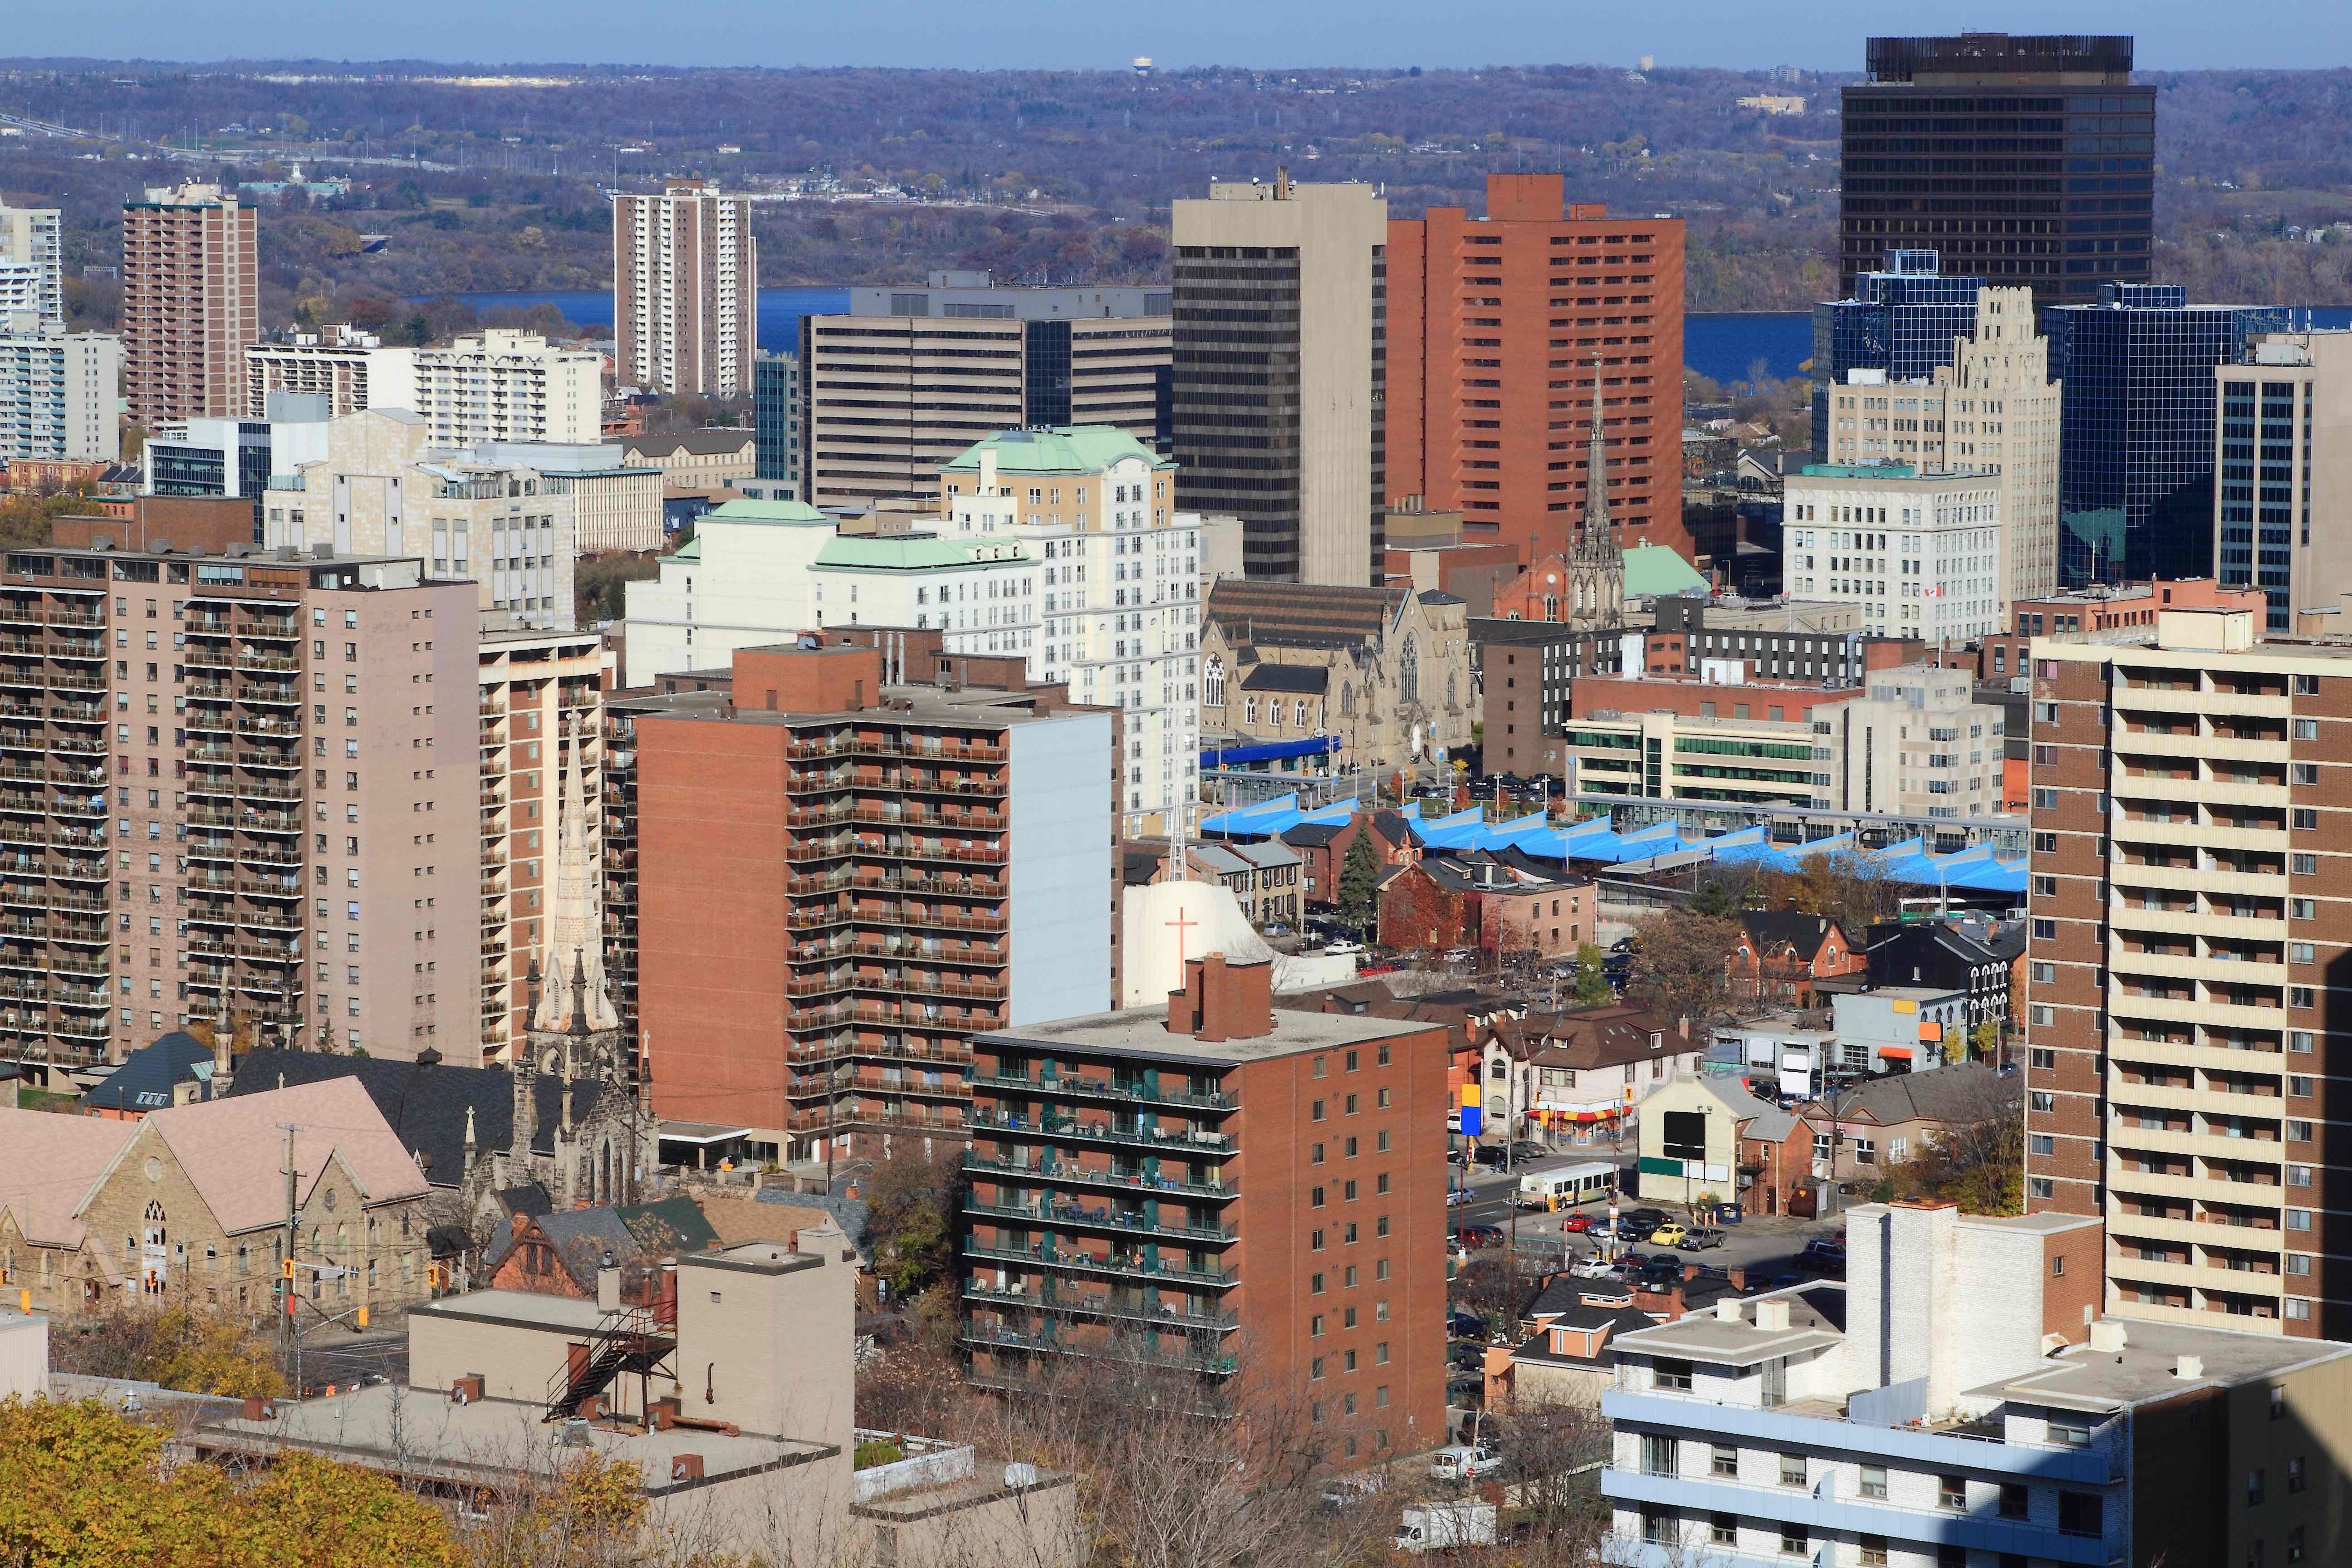 Skyline of Hamilton, Ontario